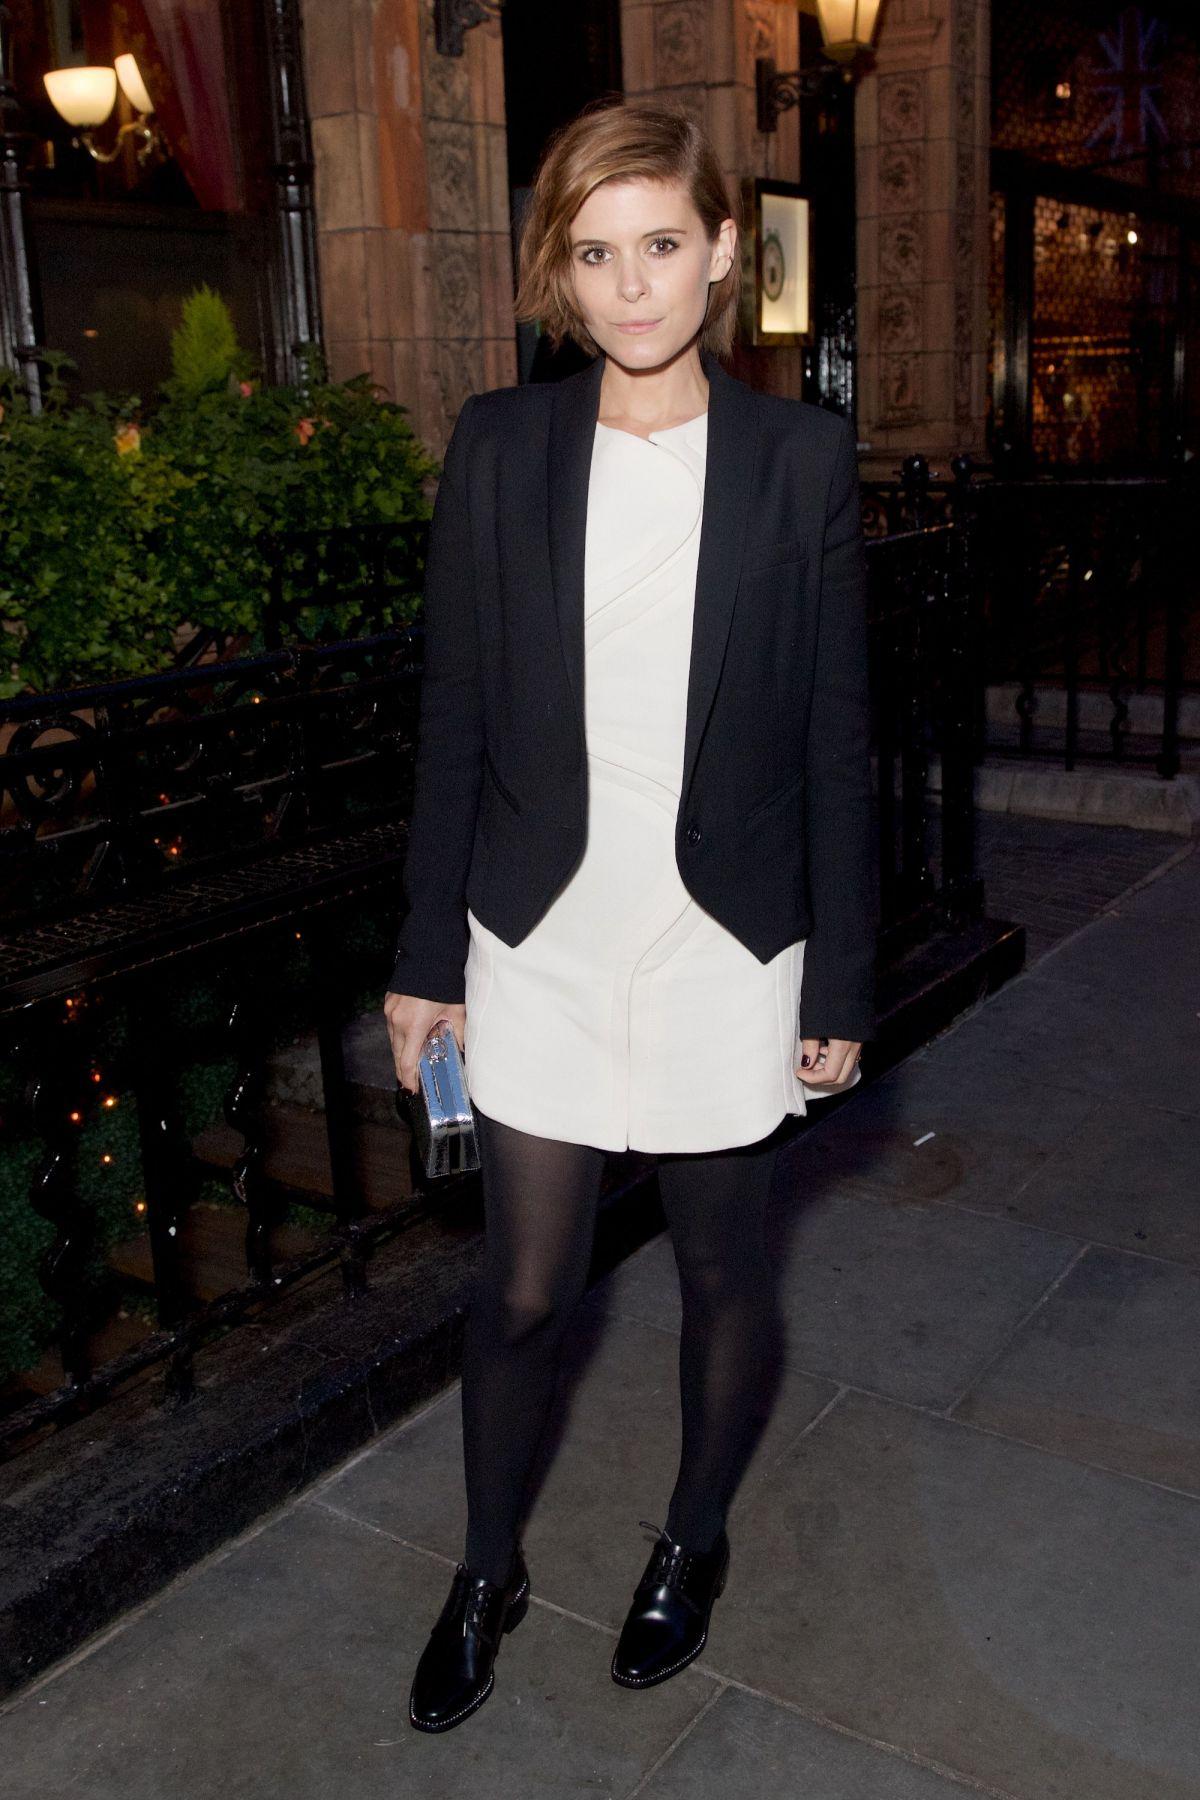 KATE MARA at Lady Dior Party in London 05/30/2016